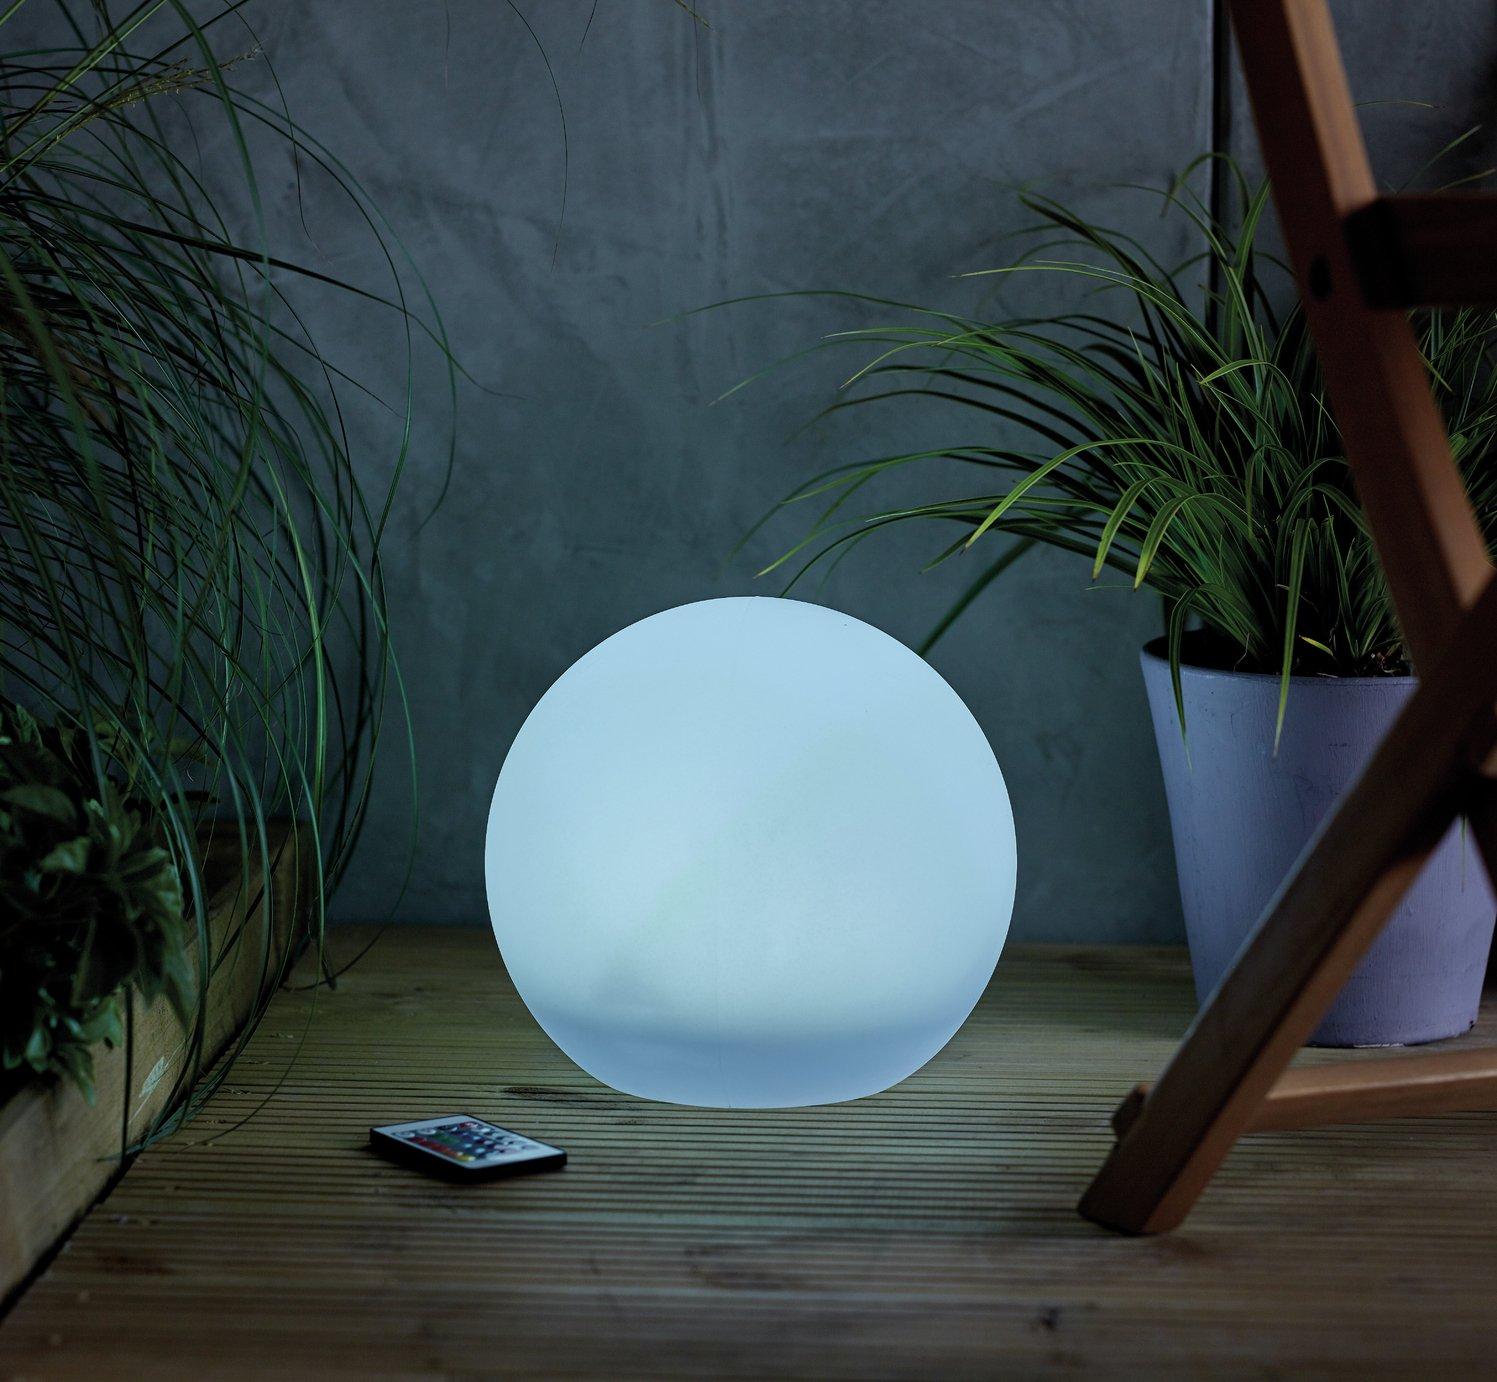 Habitat Solar USB Mood Light with Remote Control